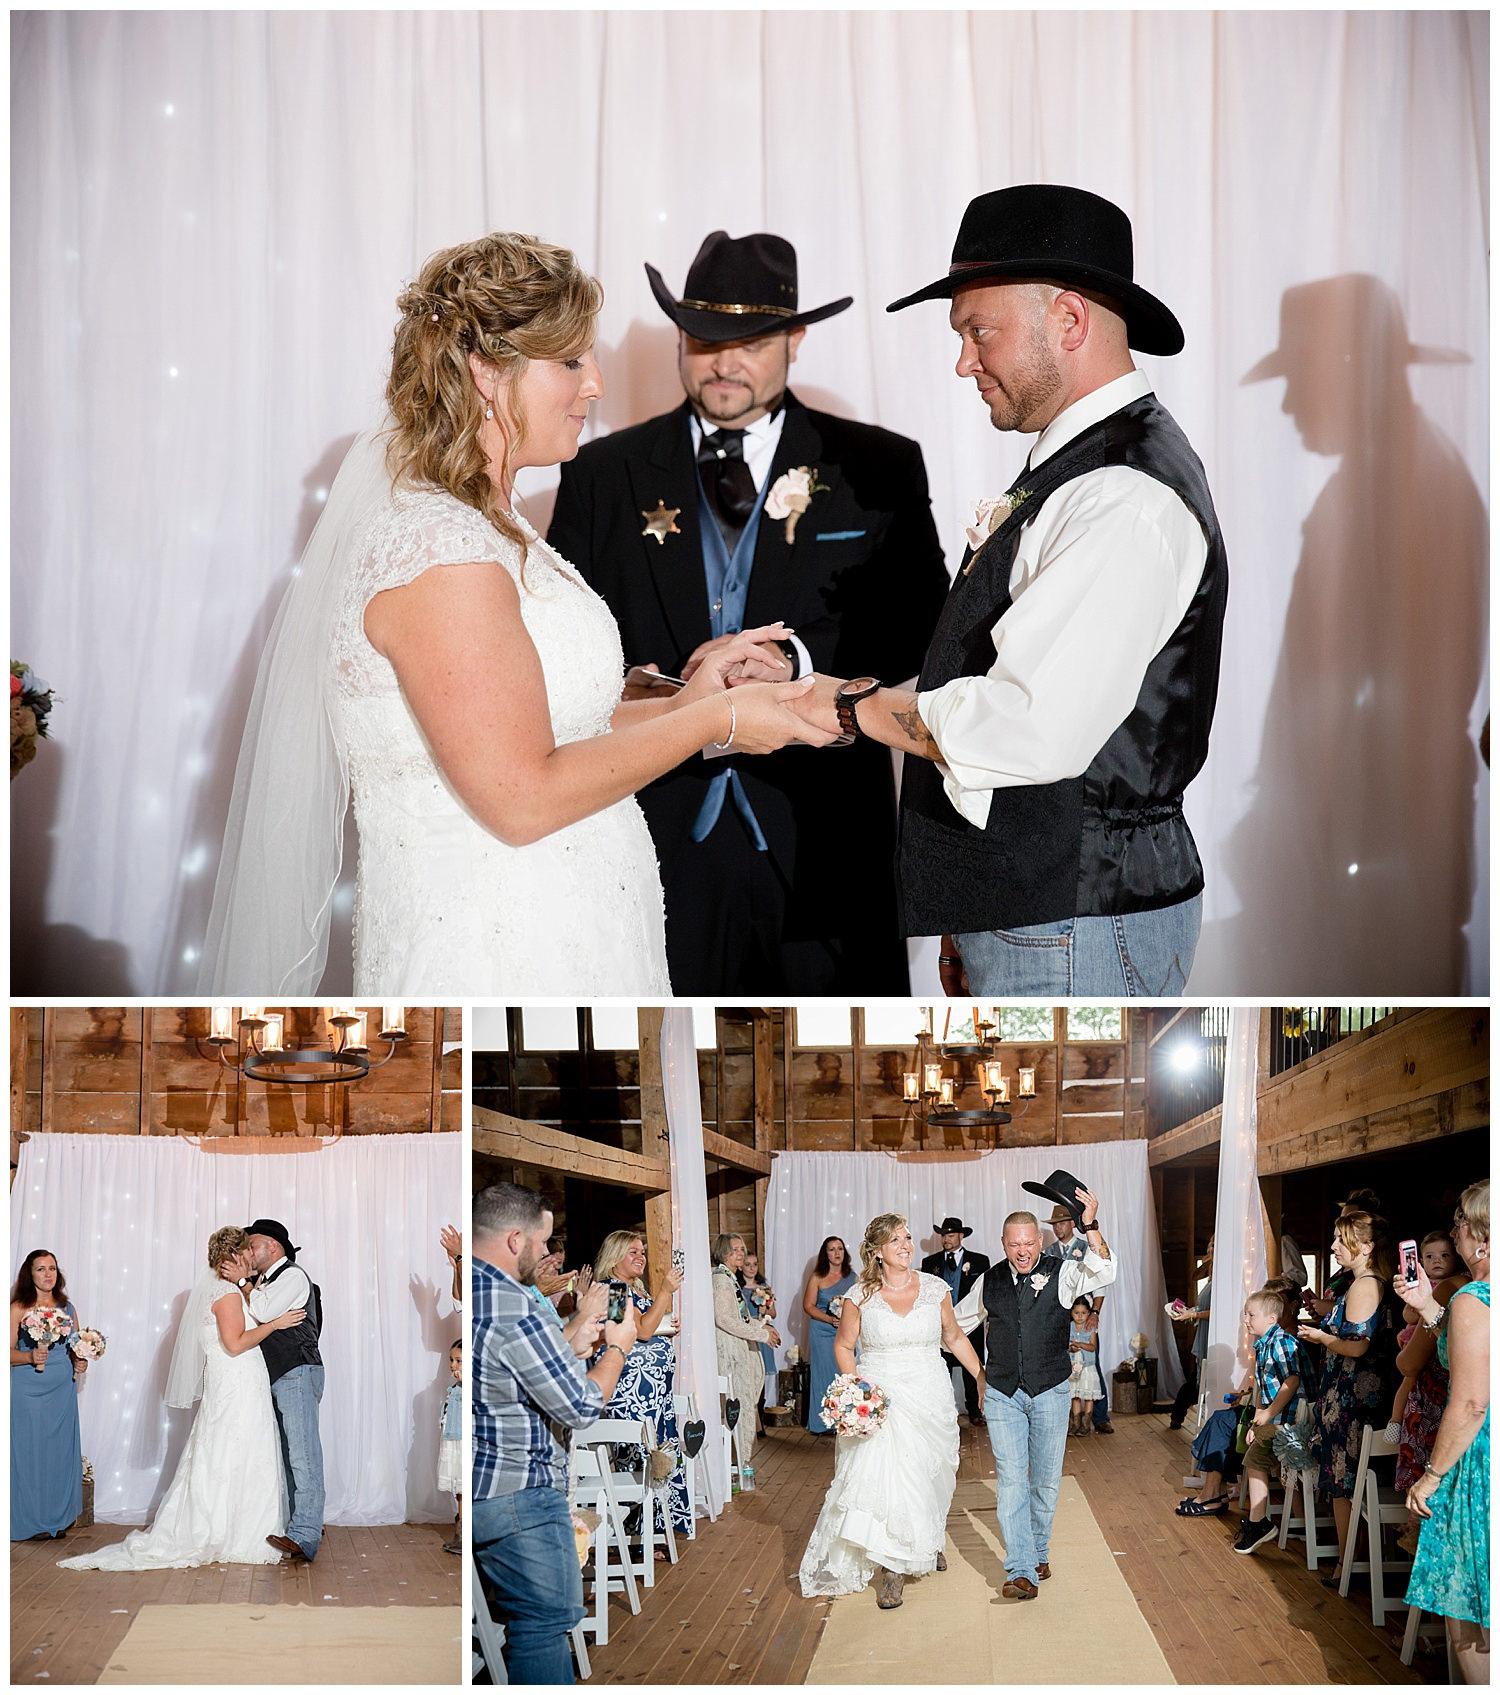 chamberlain-farms-wedding-26-north-studios